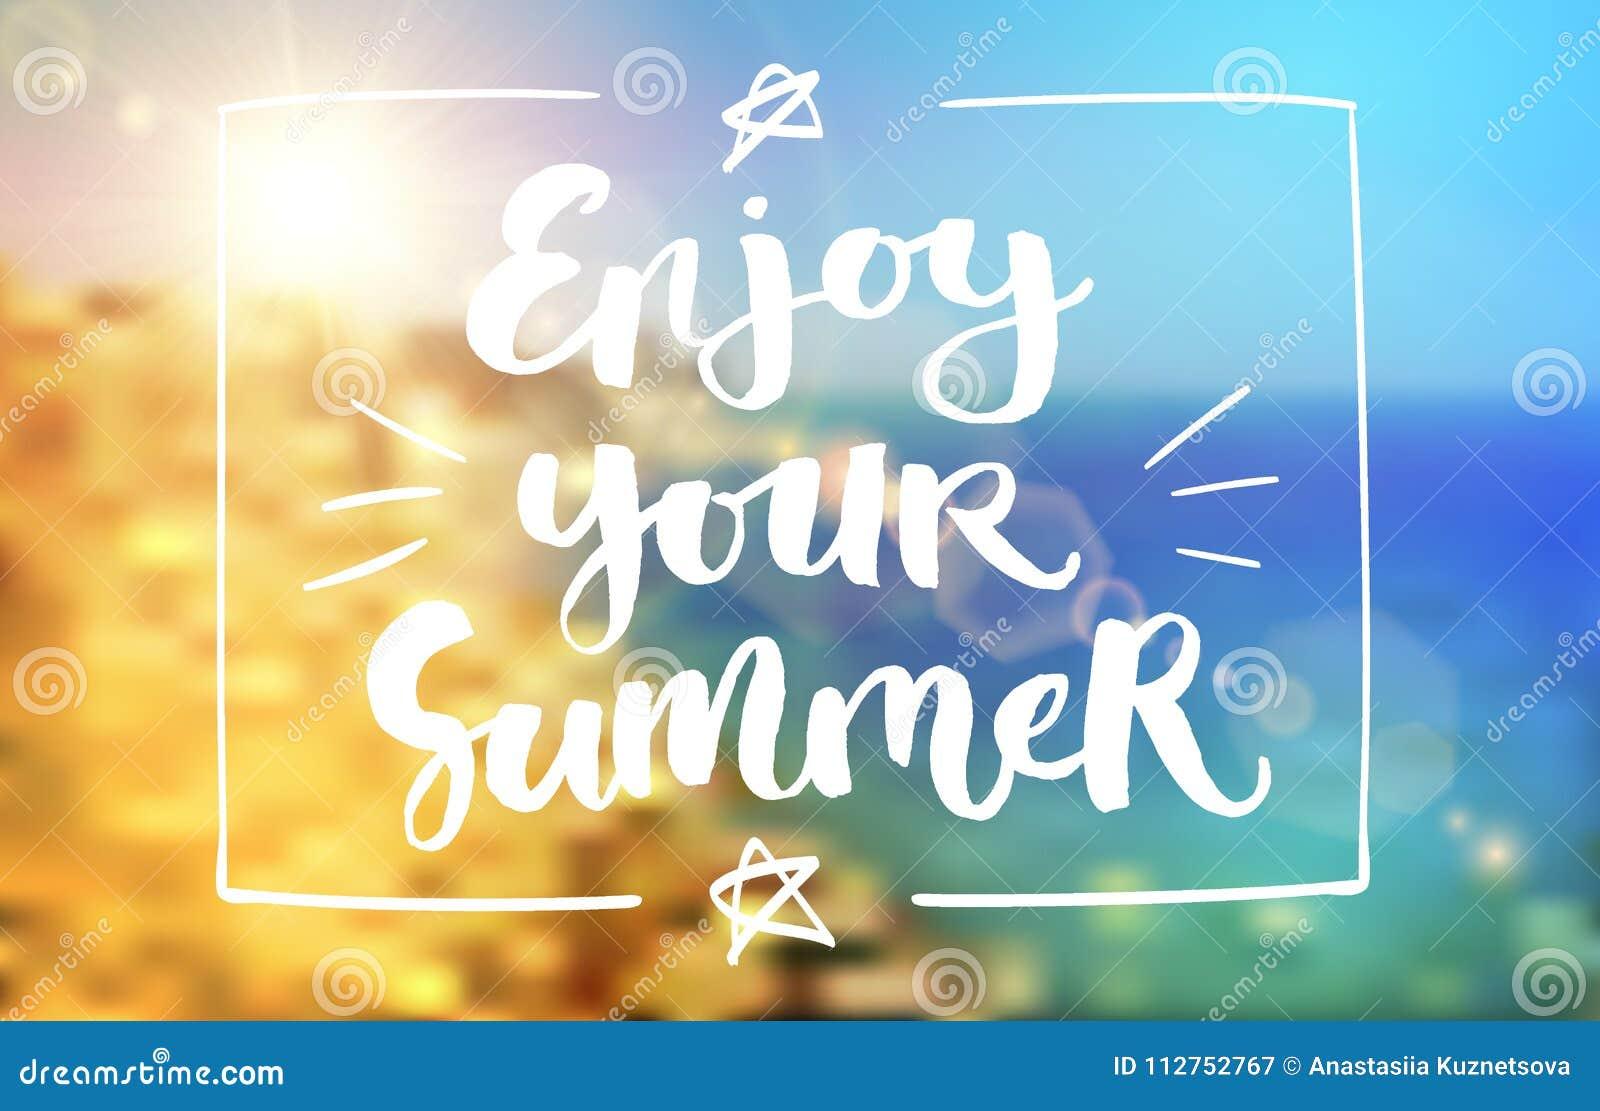 enjoy your summer lettering poster stock illustration illustration